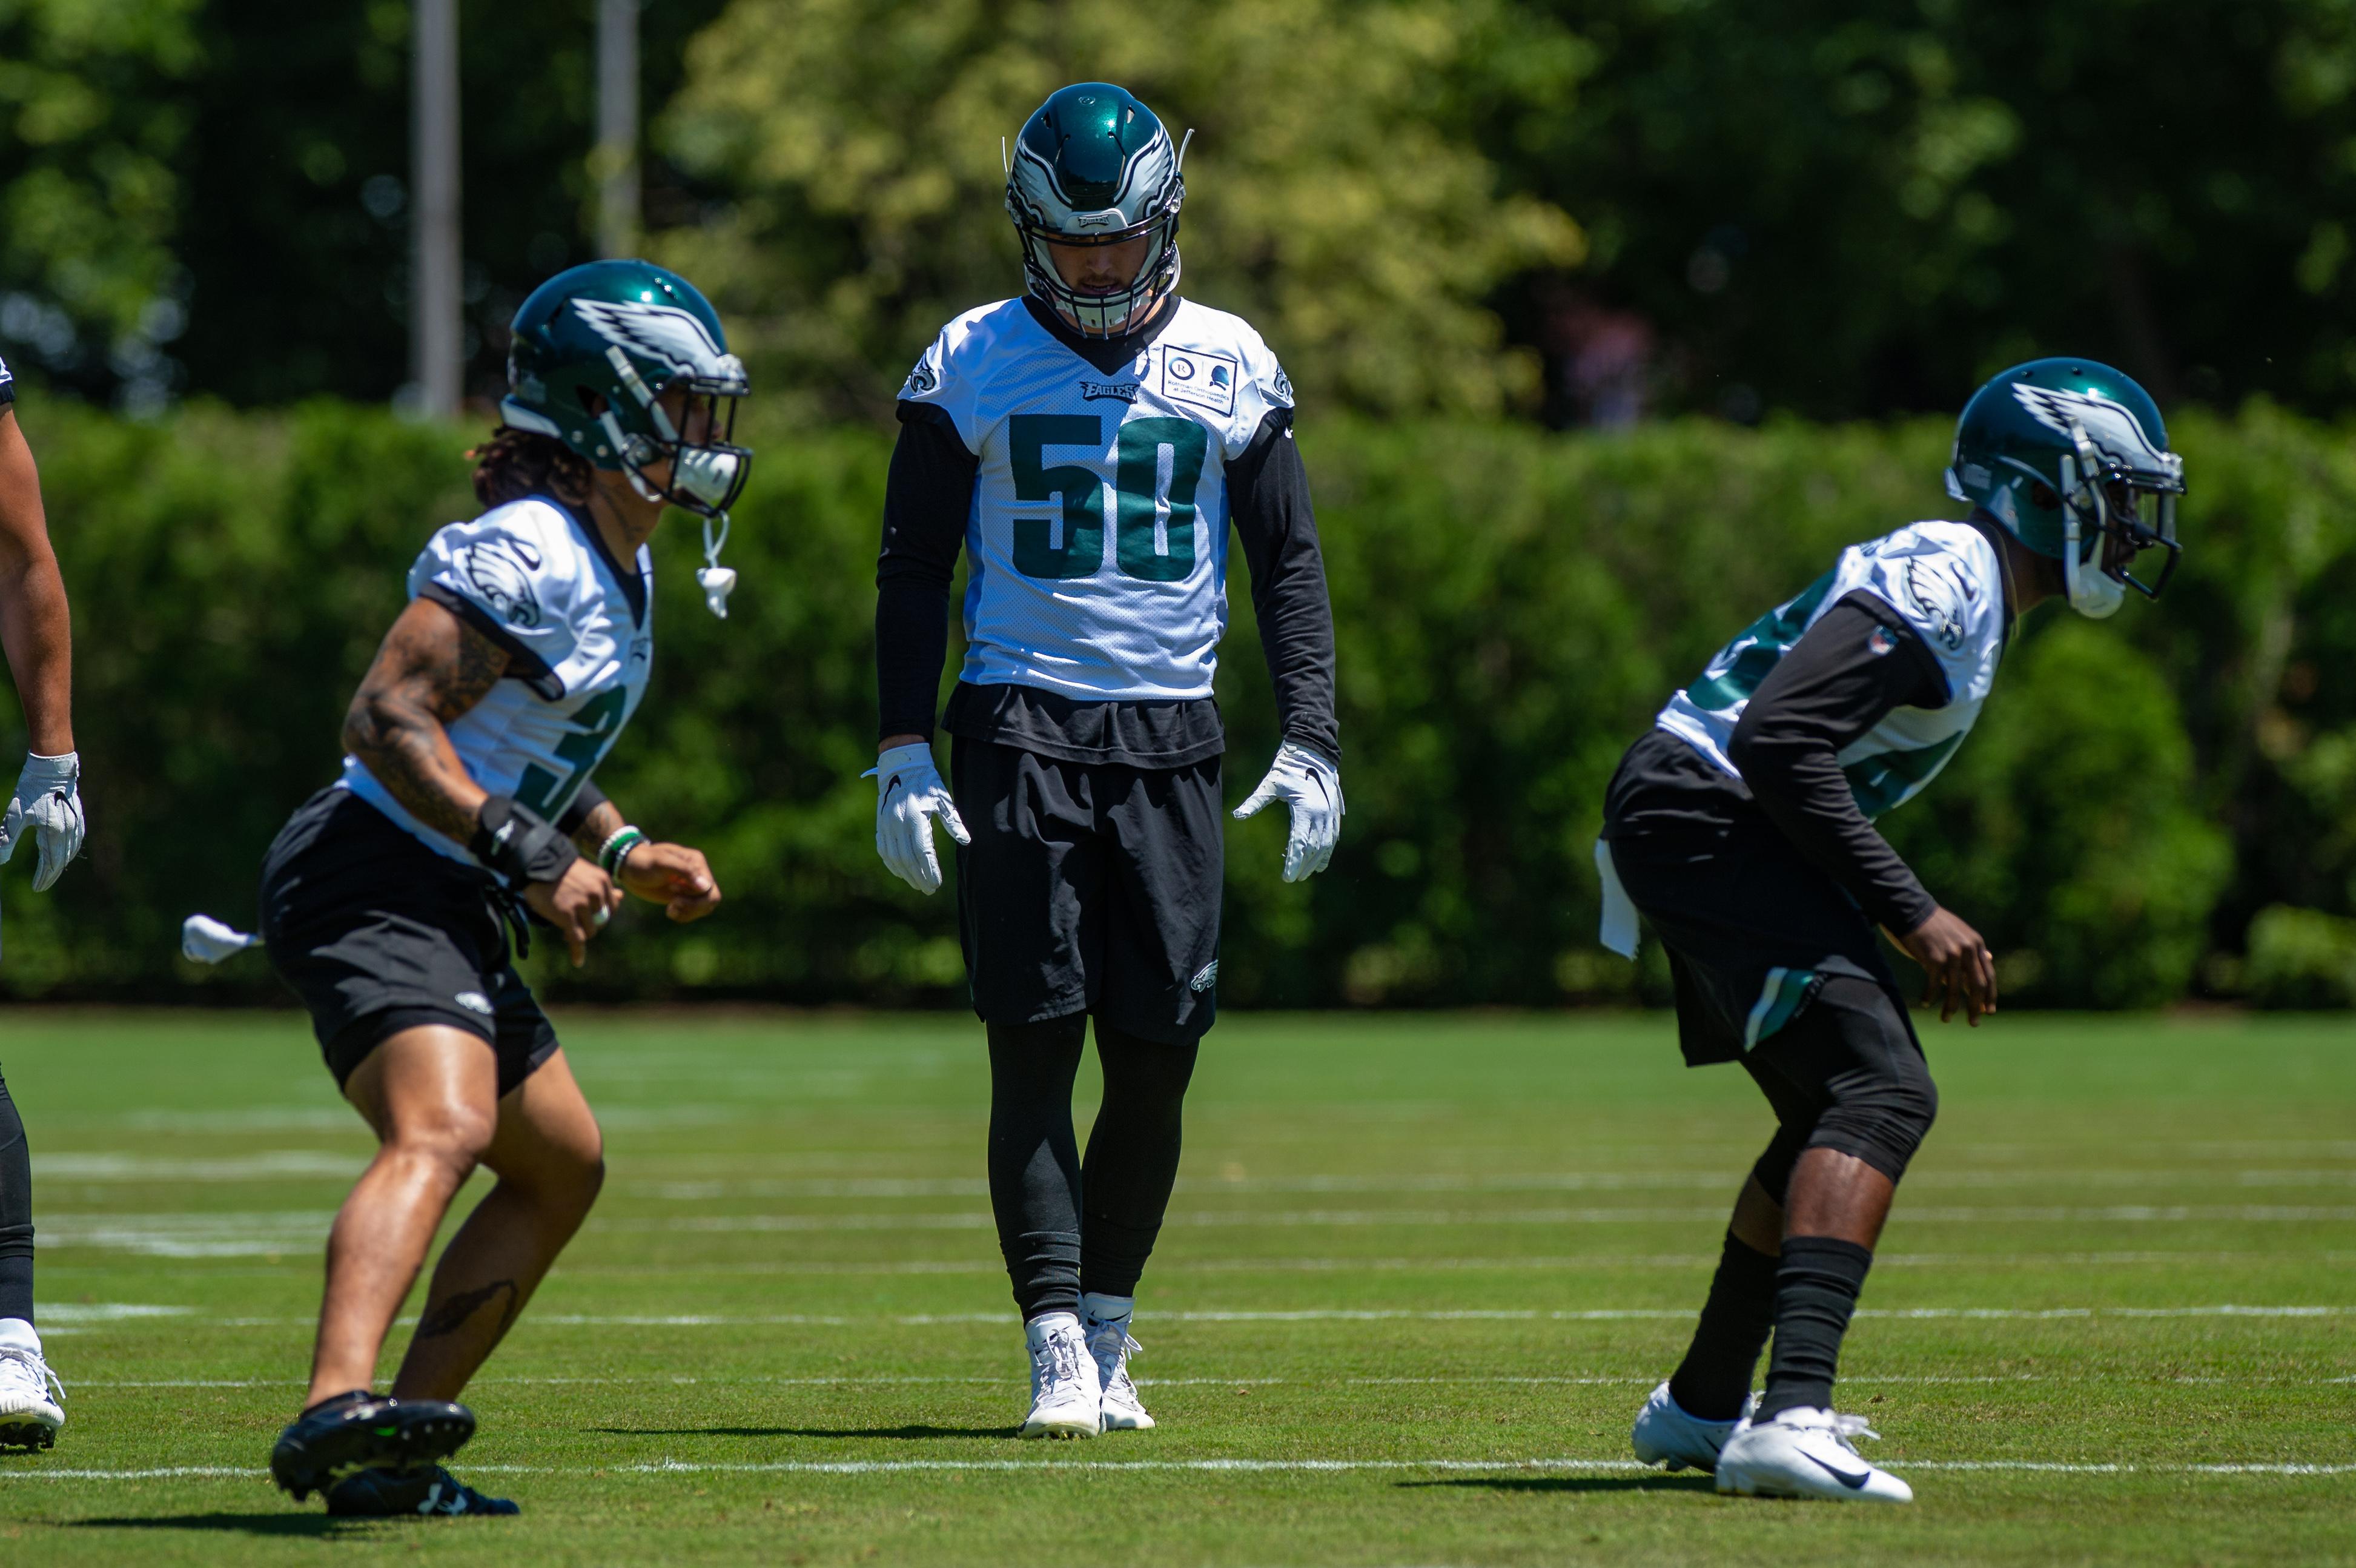 NFL: JUN 11 Philadelphia Eagles Minicamp